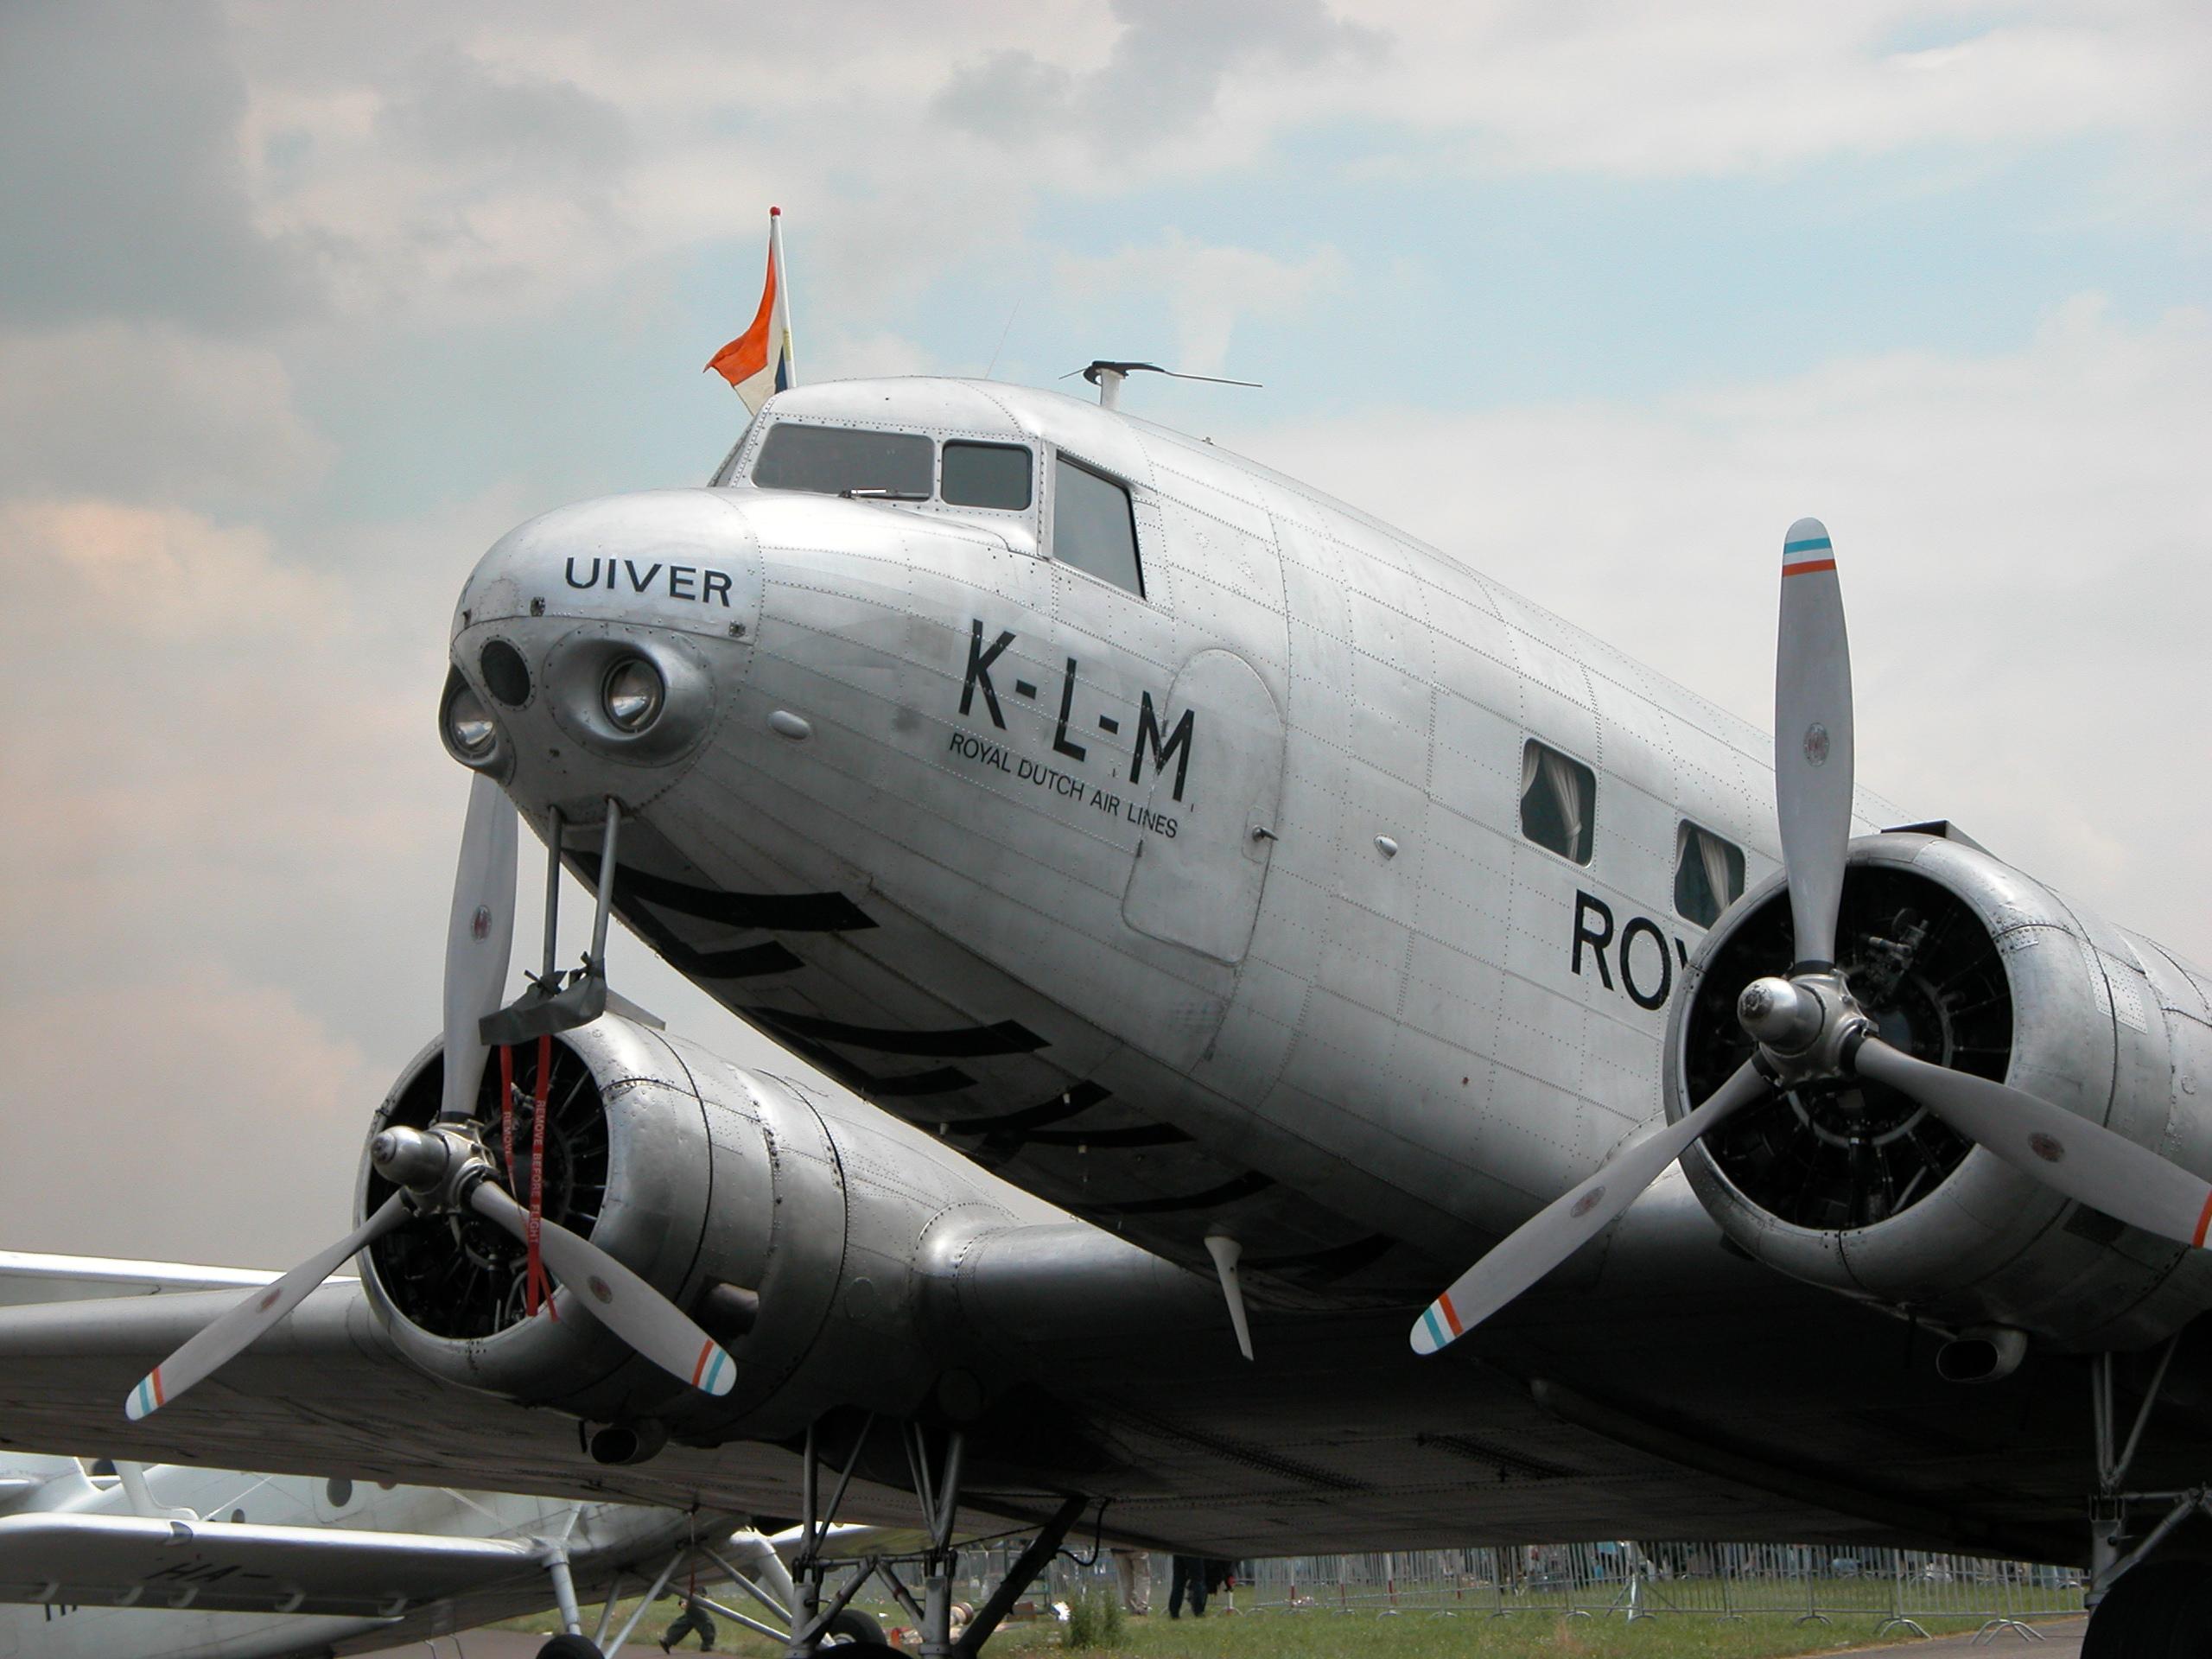 airplane plane oldtimer classic dakota klm royal dutch airlaines airpliner passanger rotors engines images